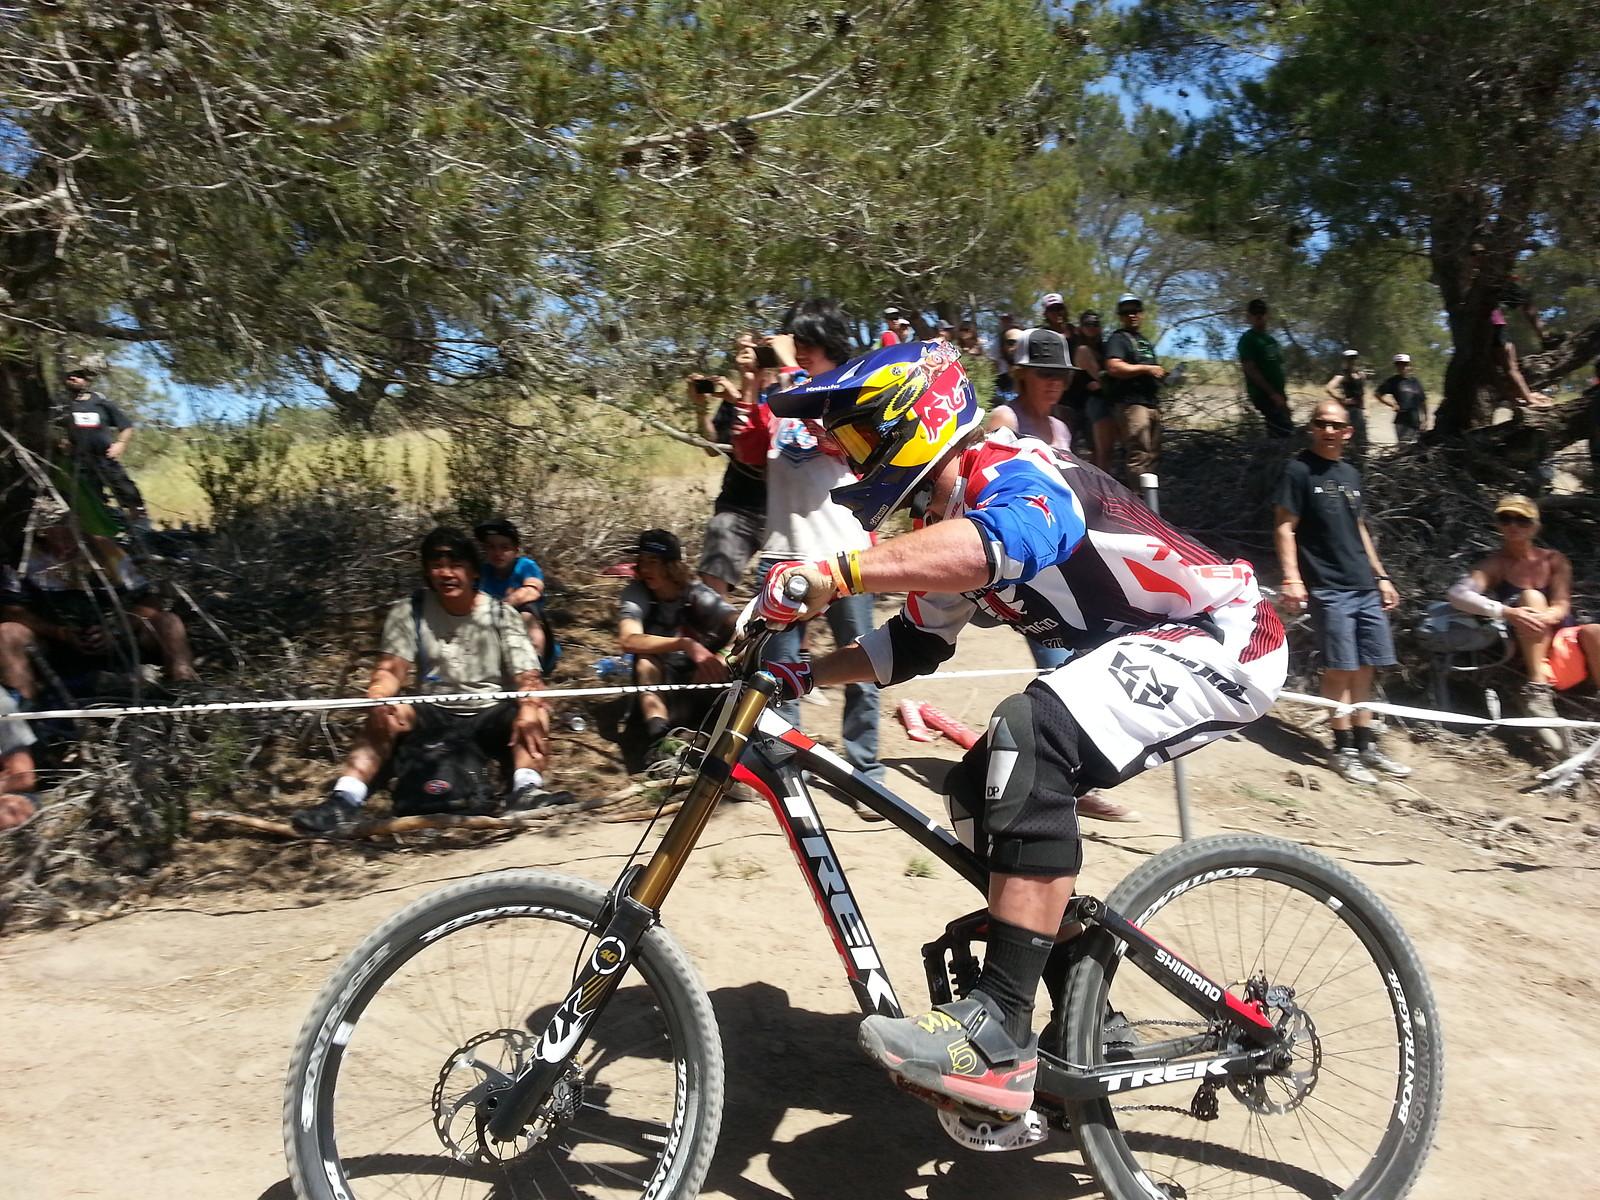 Brook 3 - djames - Mountain Biking Pictures - Vital MTB